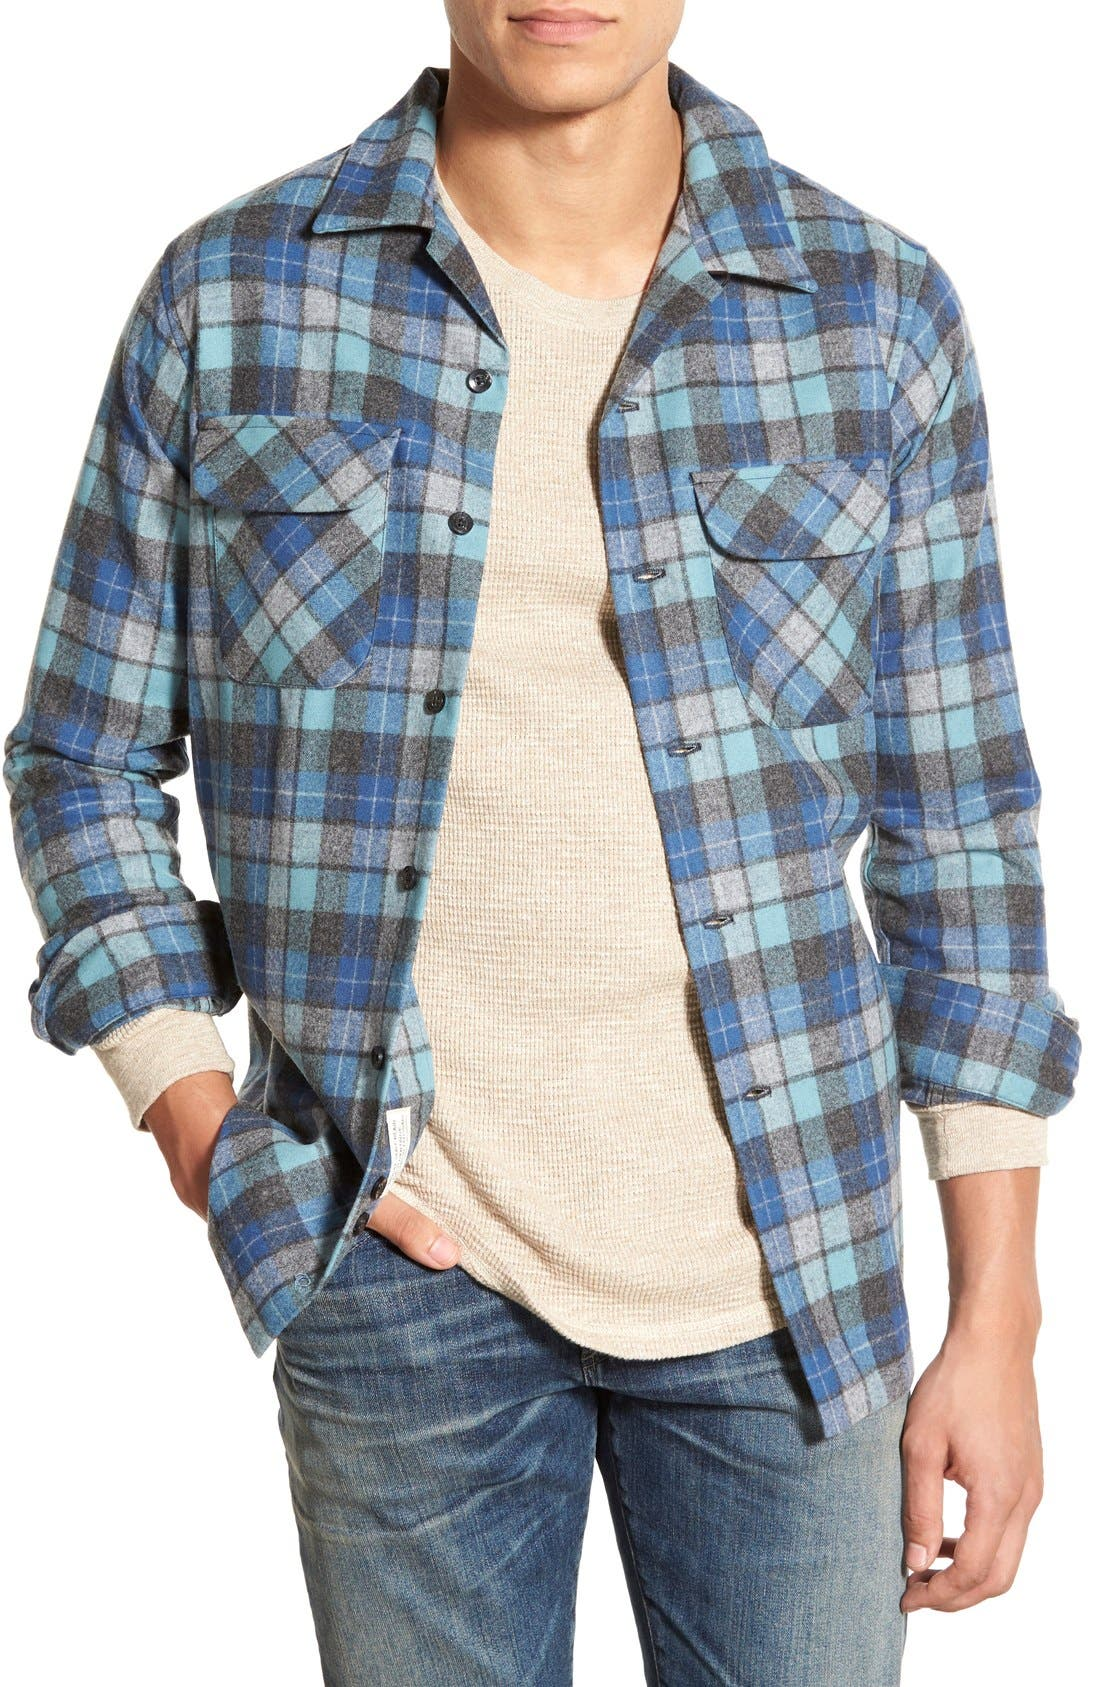 'Board' Regular Fit Flannel Shirt,                             Main thumbnail 1, color,                             Blue Original Surf Plaid